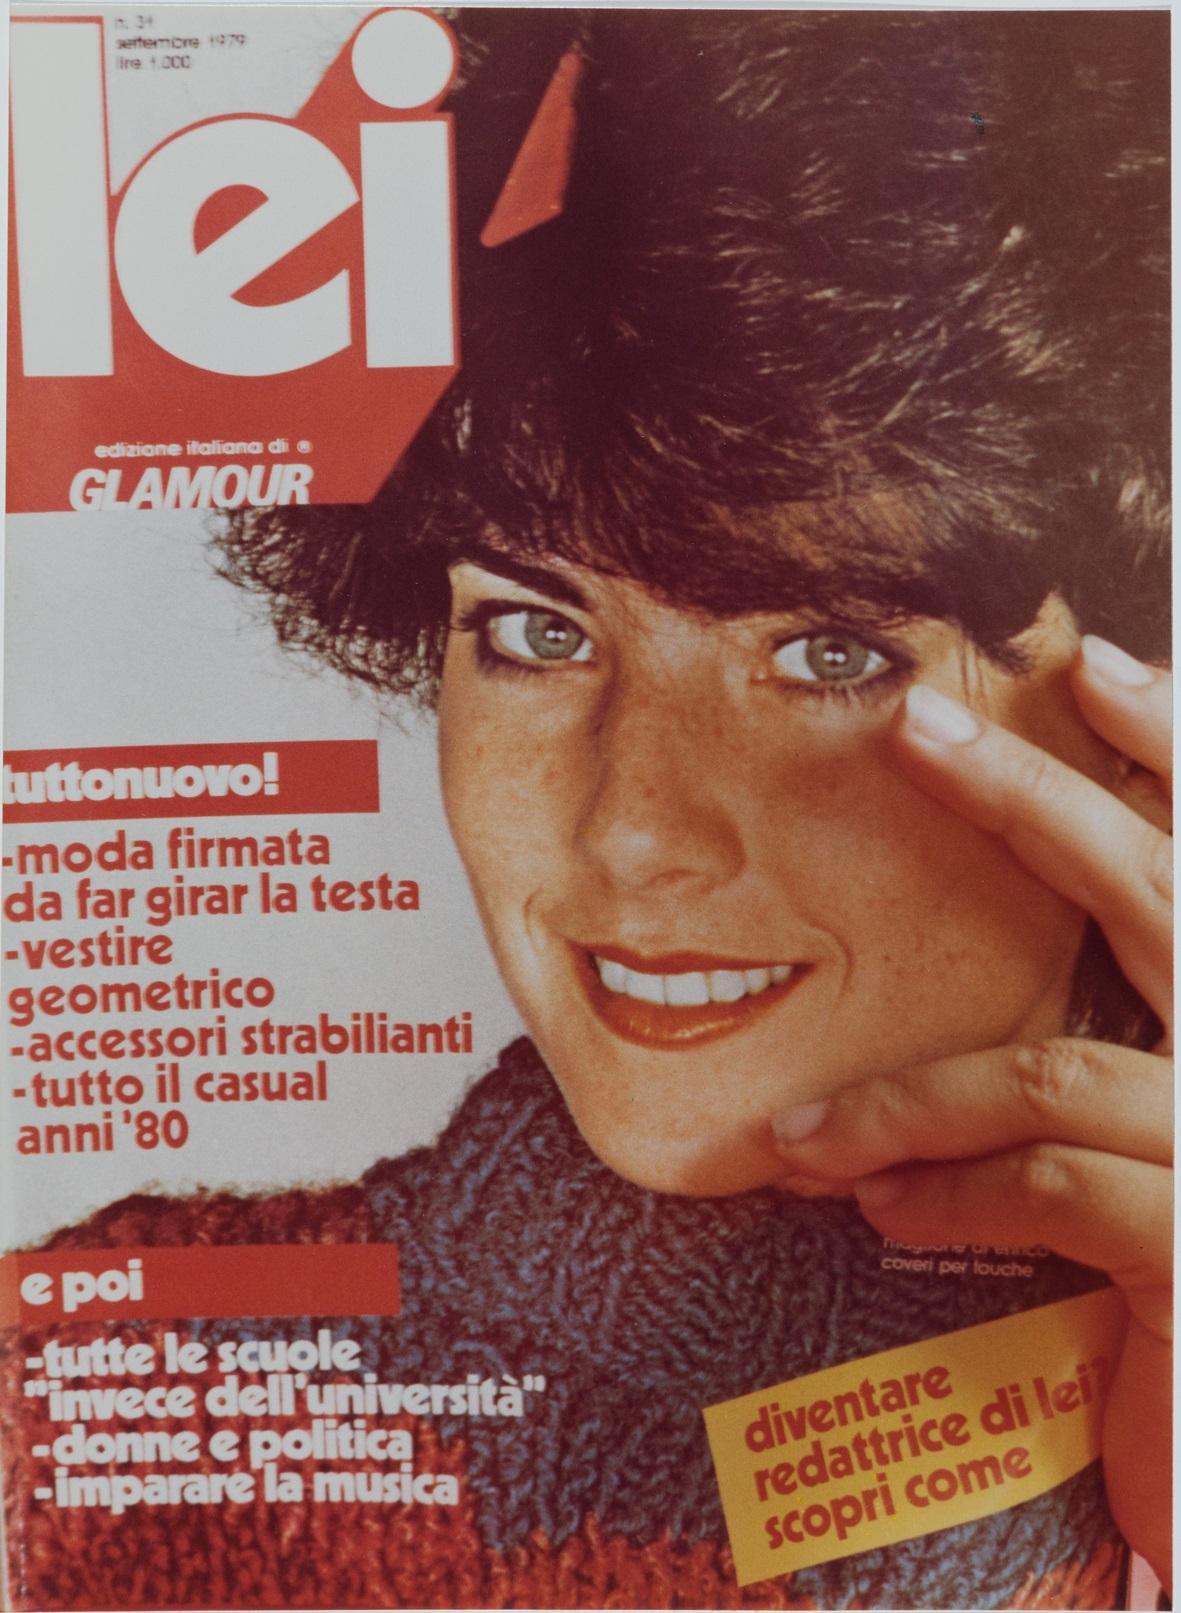 Modena, 1979